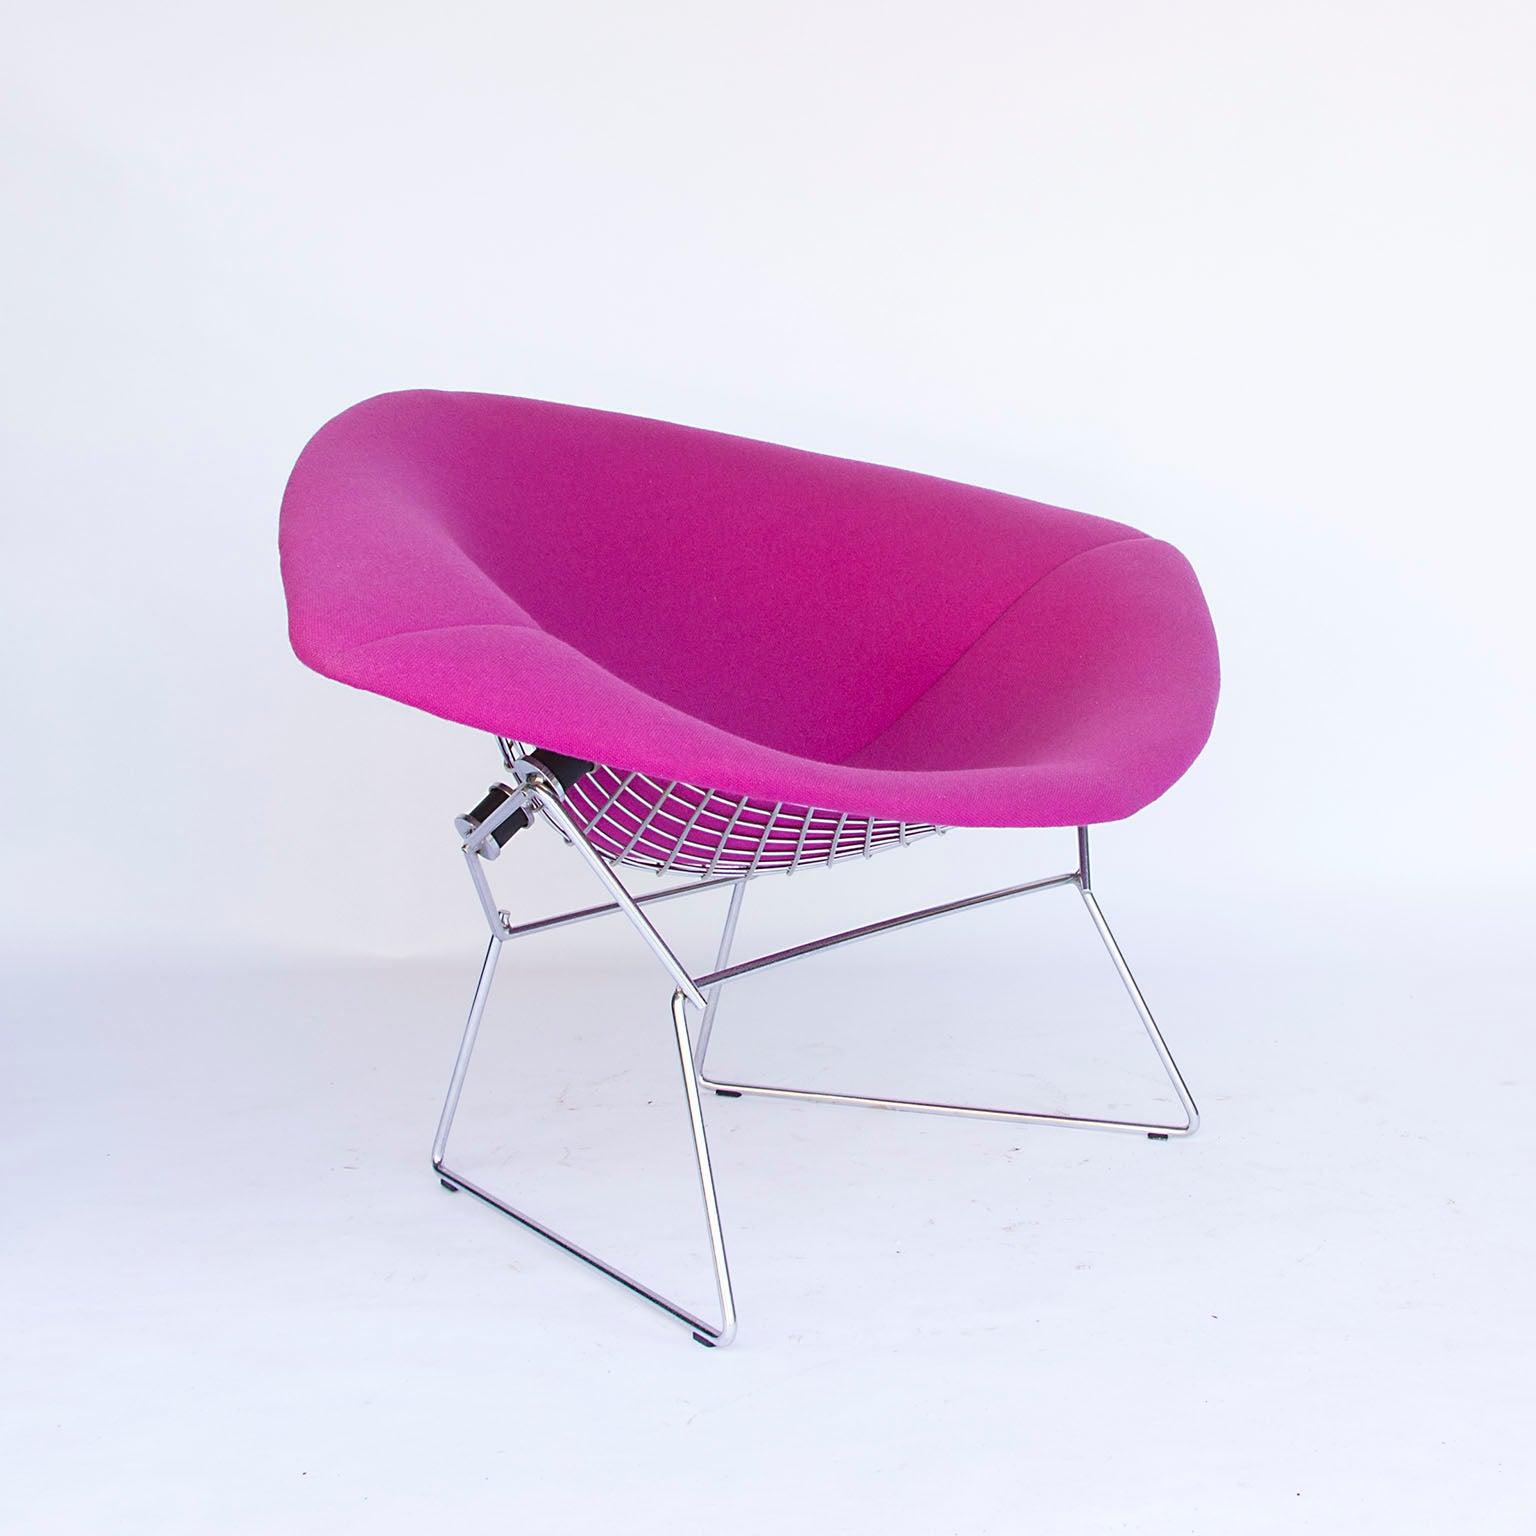 Egg Chair Roze.1952 Harrie Bertoia Large Diamond Chair With Original Full